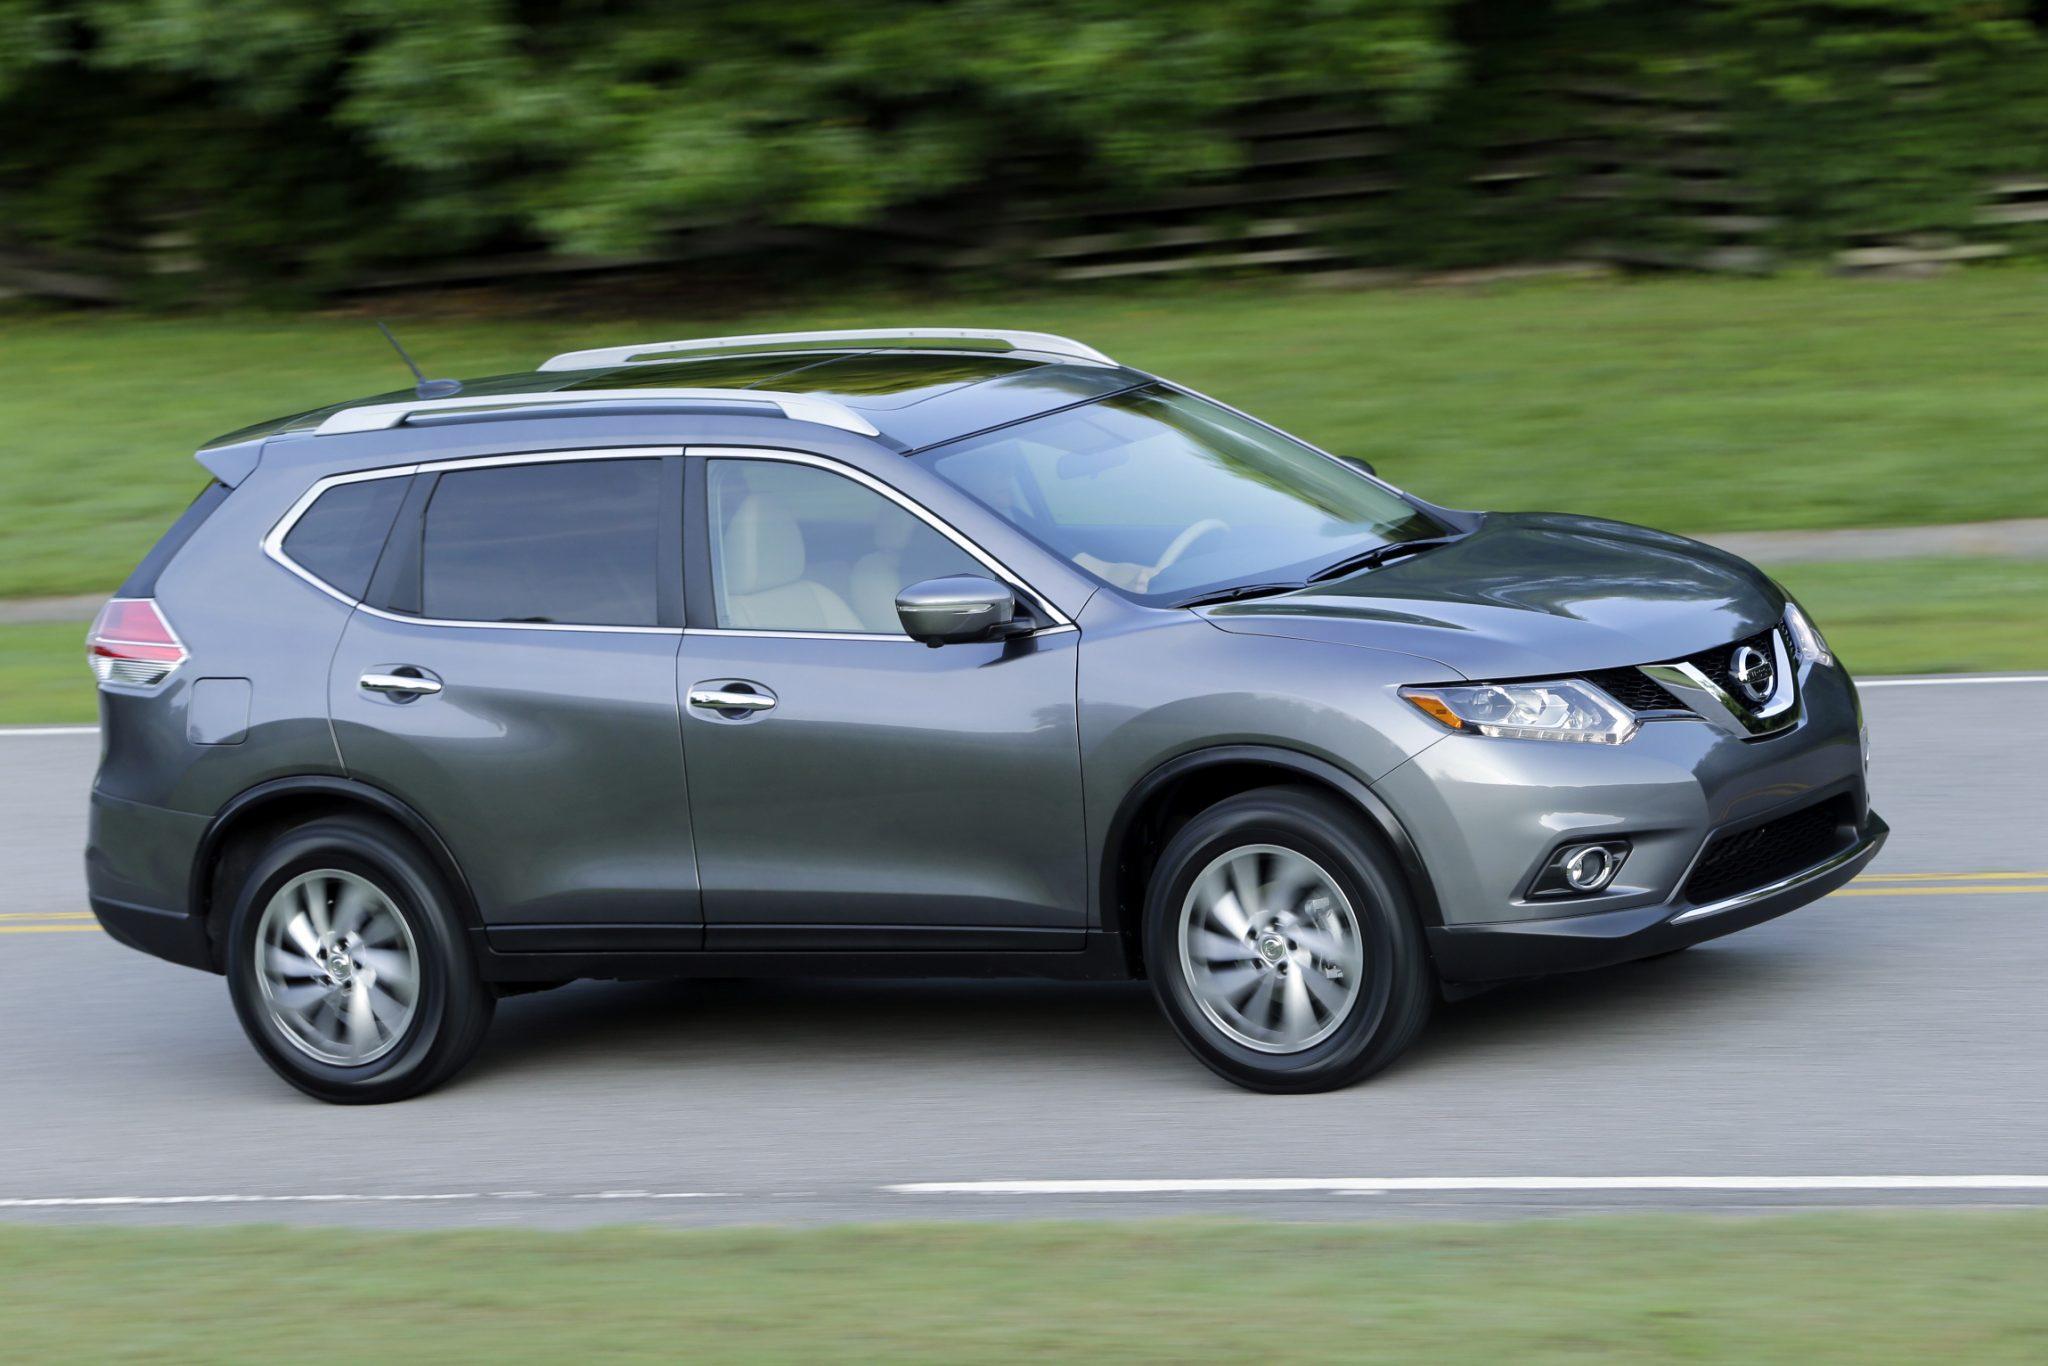 2014 Nissan Rogue APEAL Study